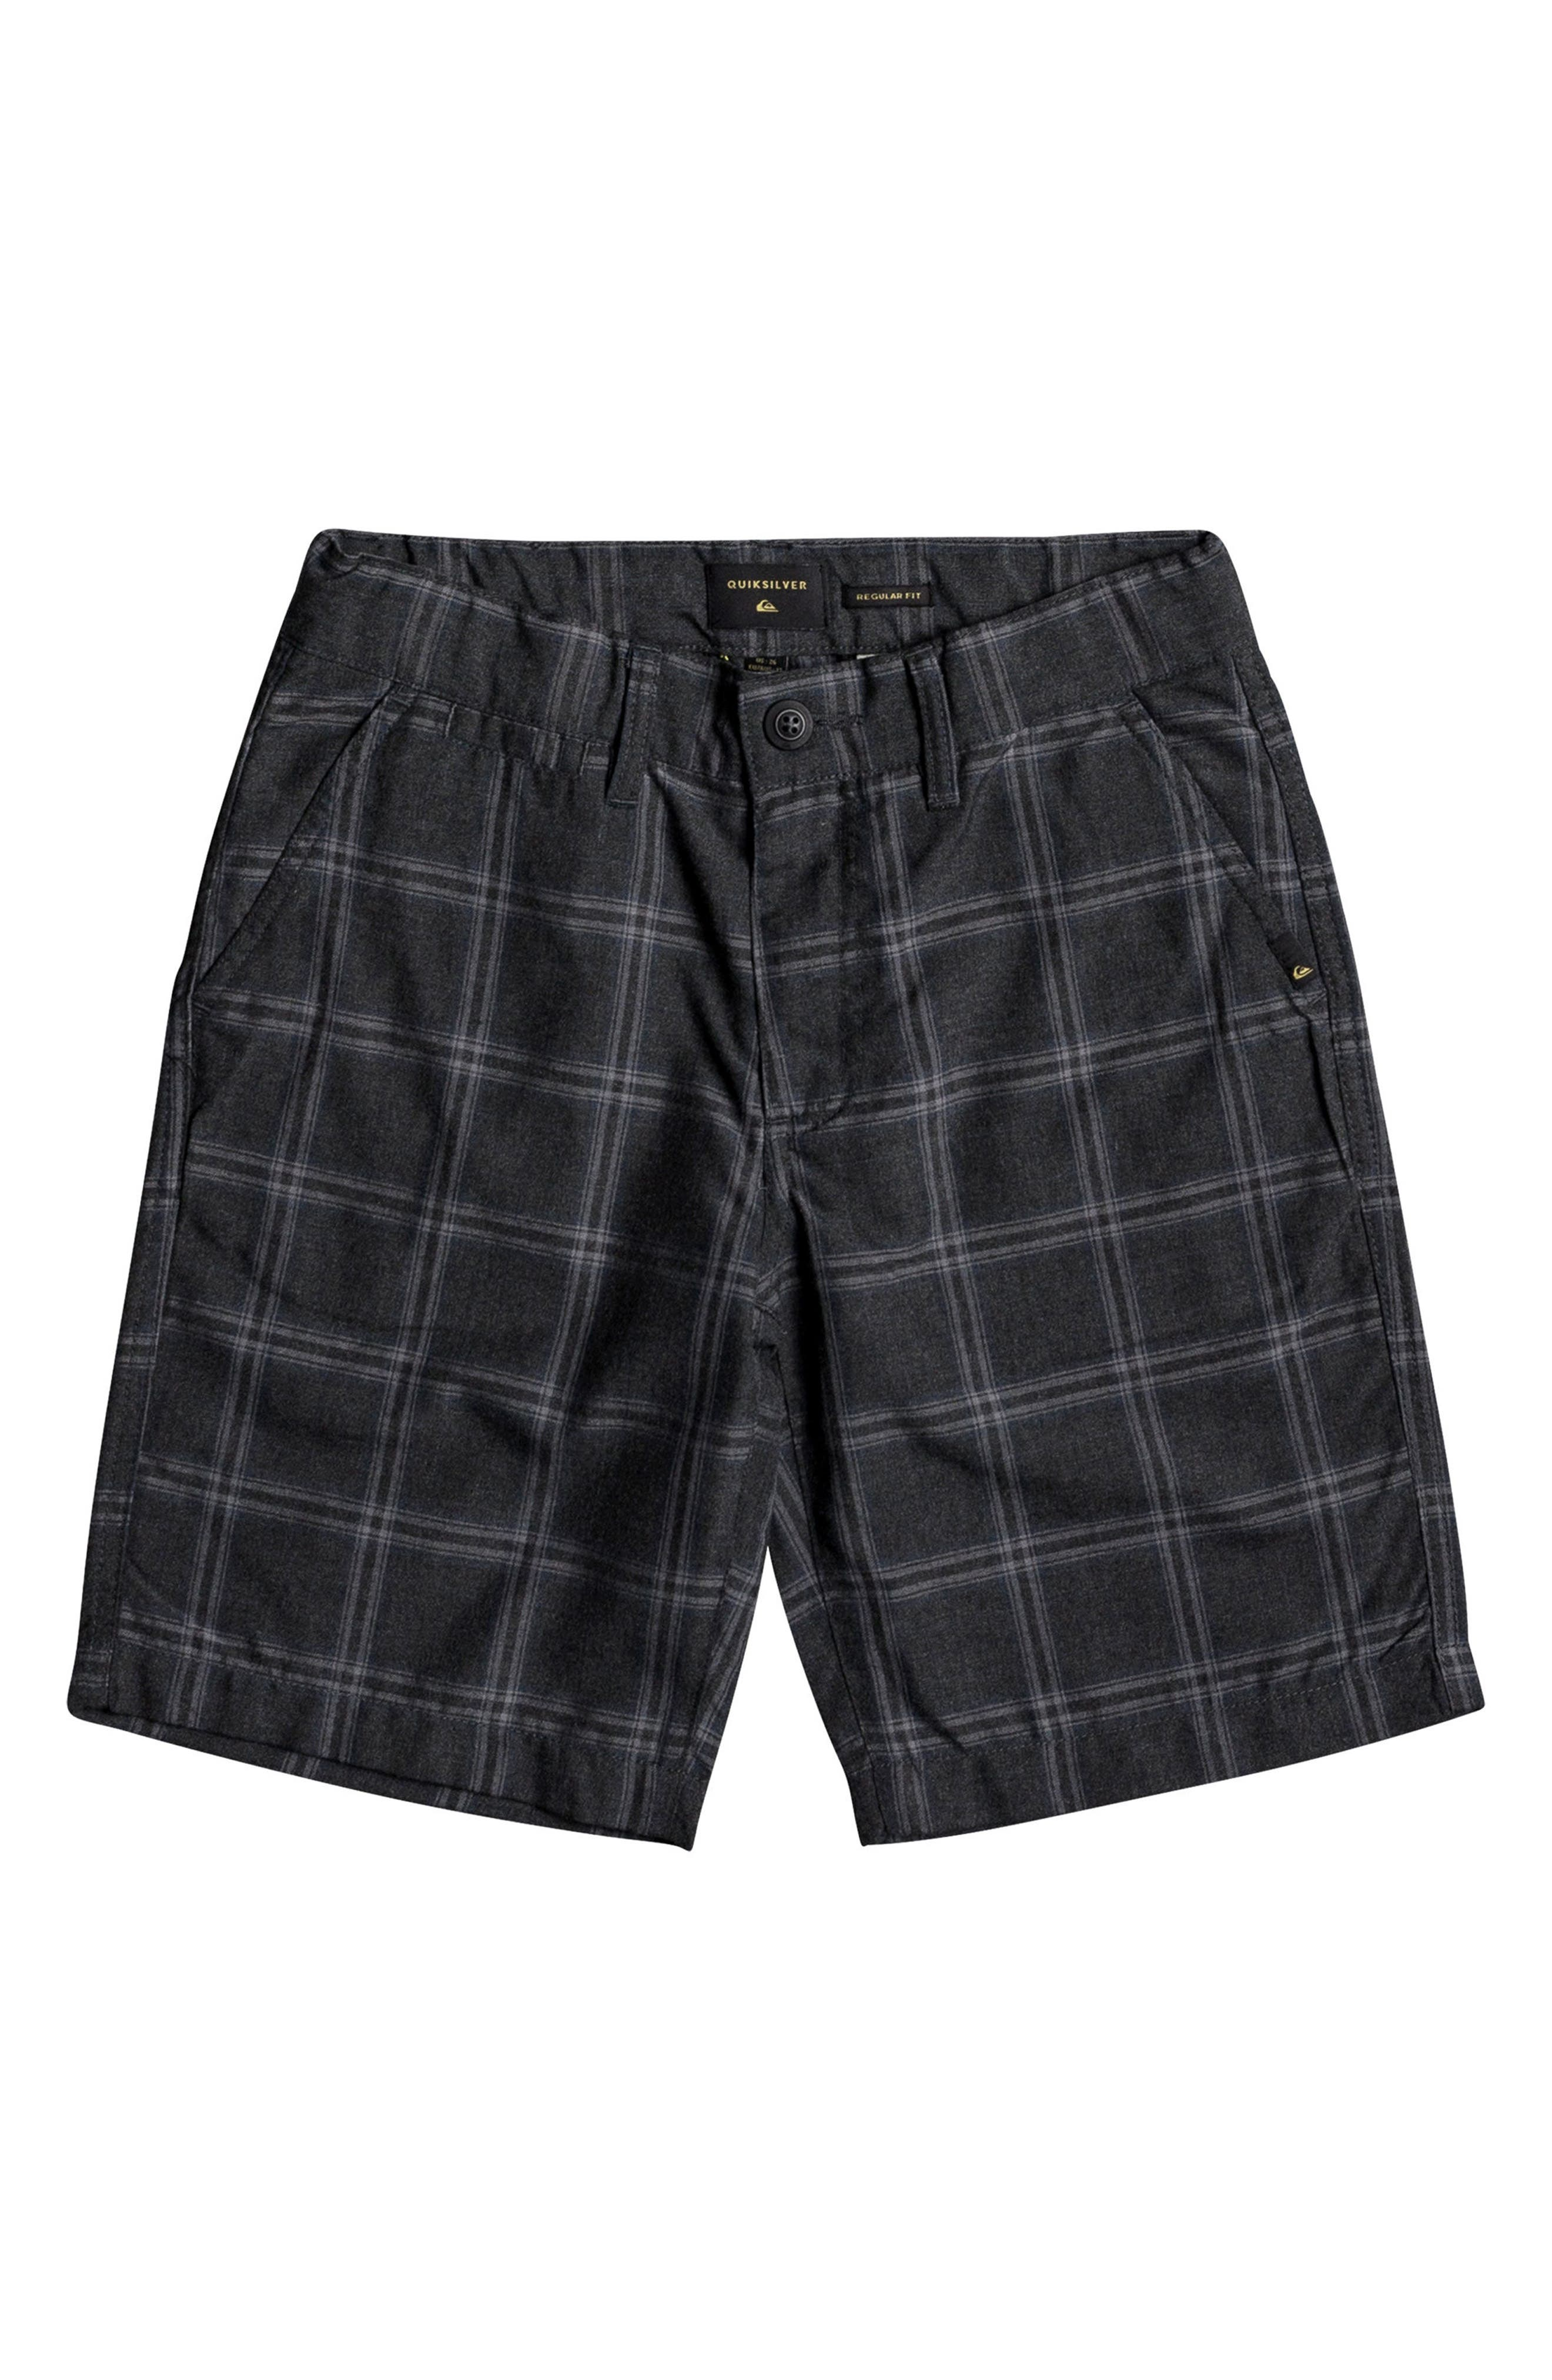 Alternate Image 1 Selected - Quiksilver Regeneration Shorts (Big Boys)